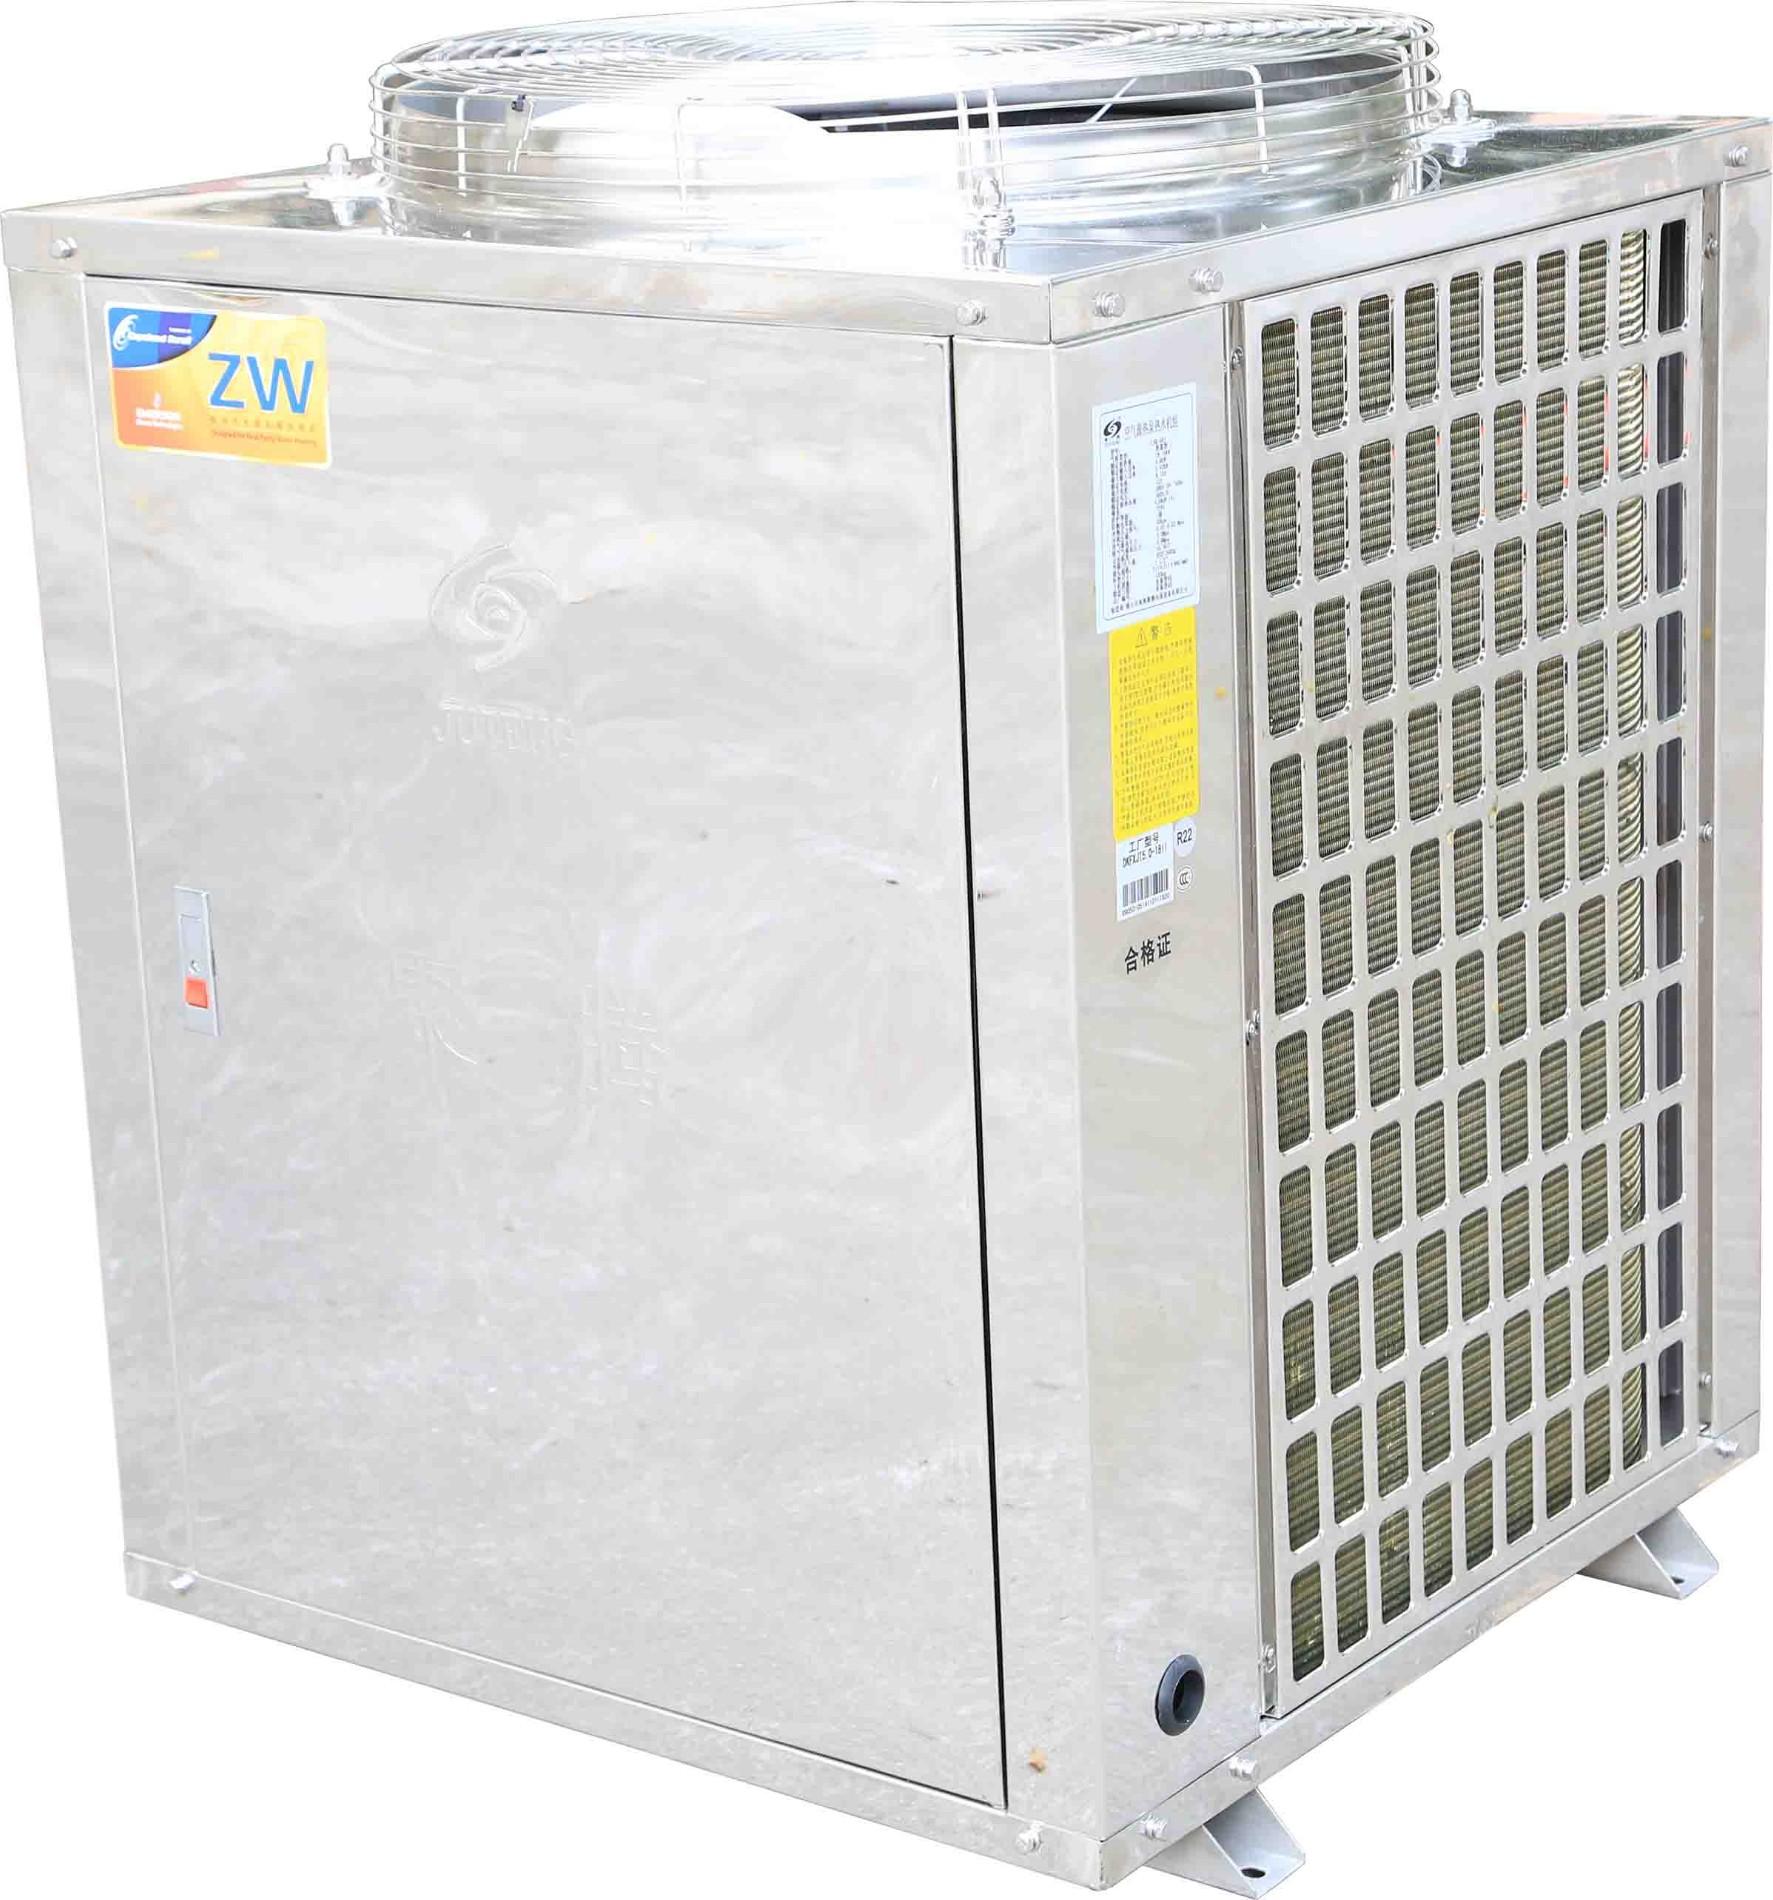 High quality energy saving techology  Hospital Heat Pump Air Source Quotes,China heat pump equipment Hospital Heat Pump Air Source Factory, pump equipmentHospital Heat Pump Air Source Purchasing